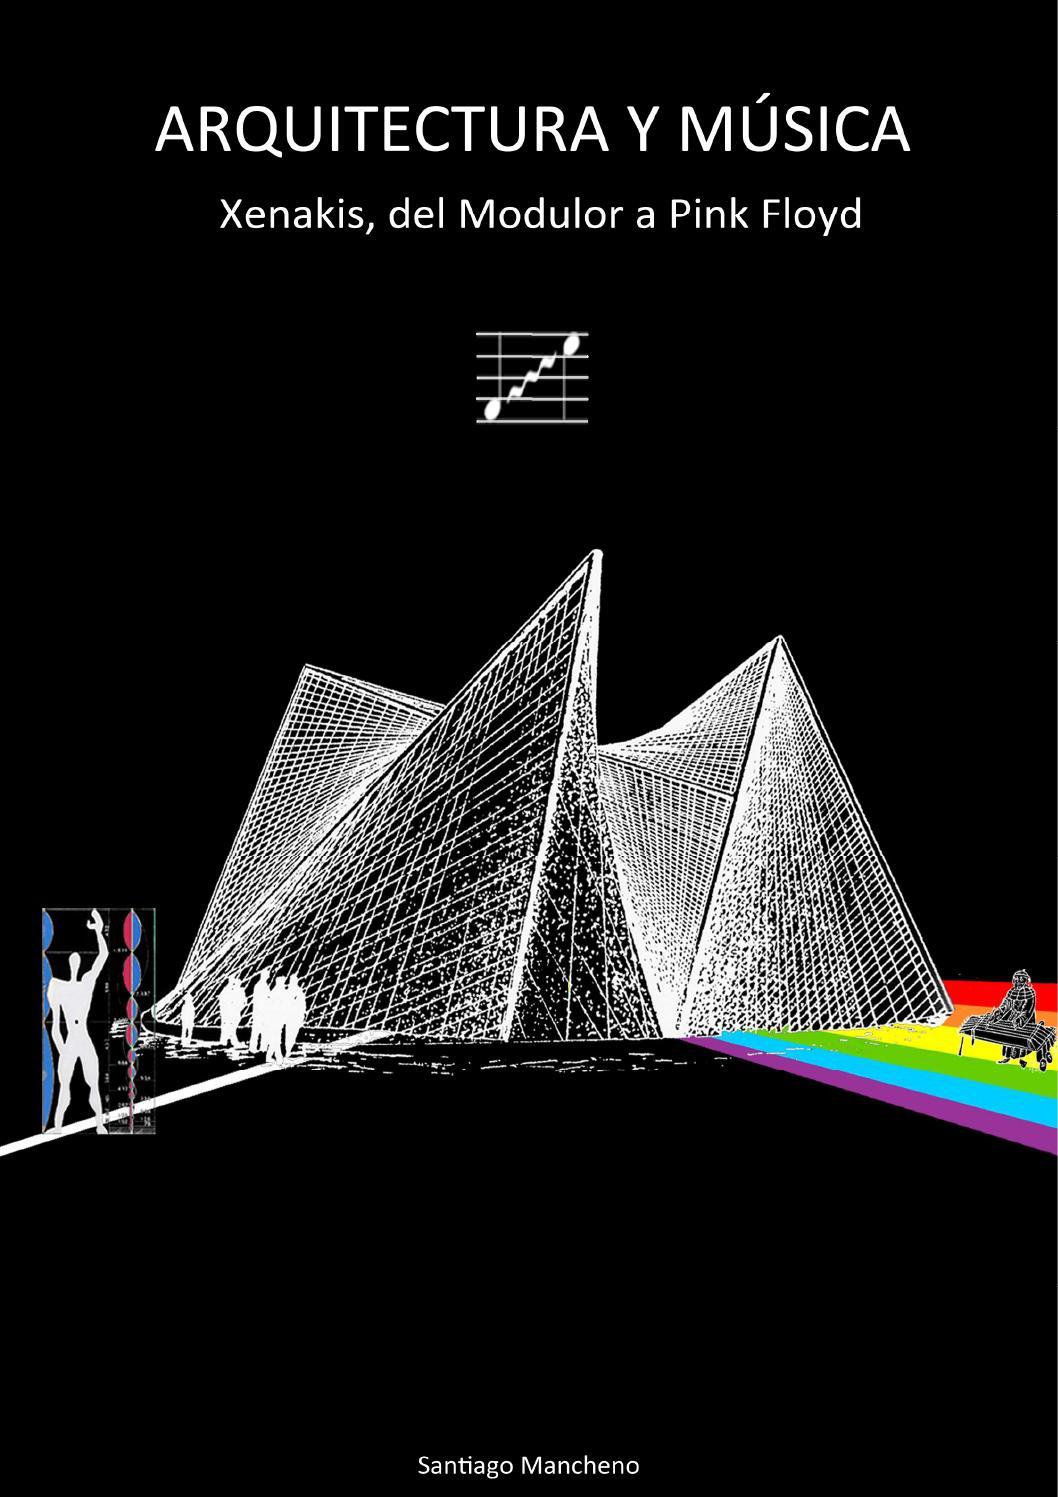 Arquitectura y Musica by santiago mancheno - issuu